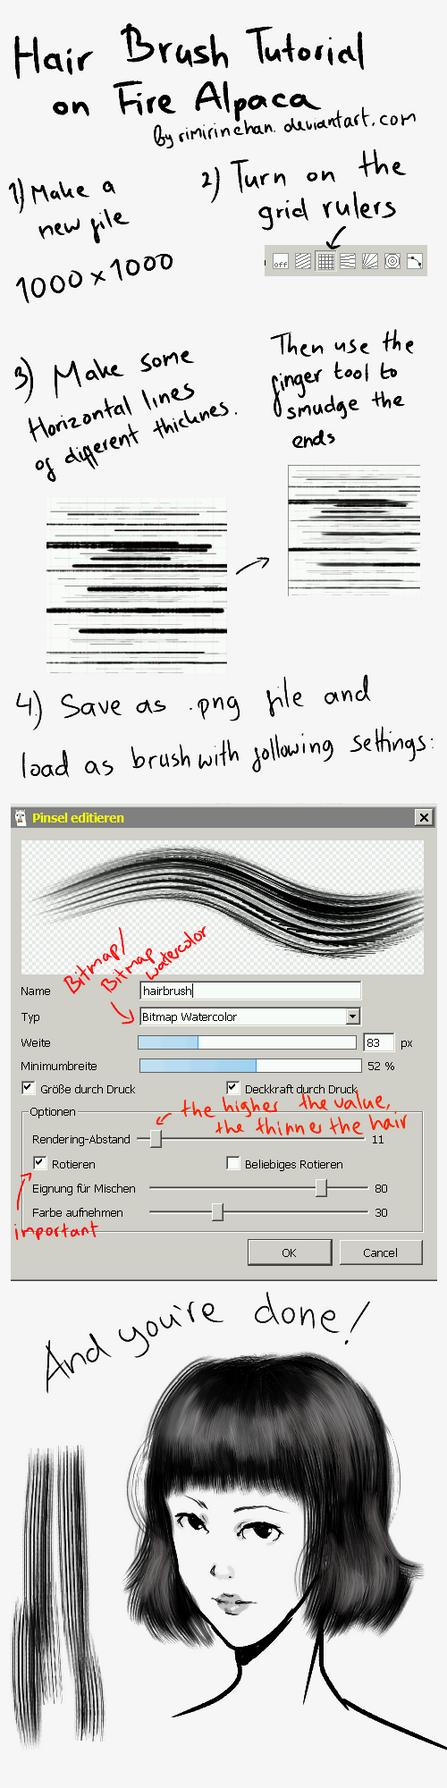 Hair Brush/ Flat Brush Tutorial on FireAlpaca by rimirinchan